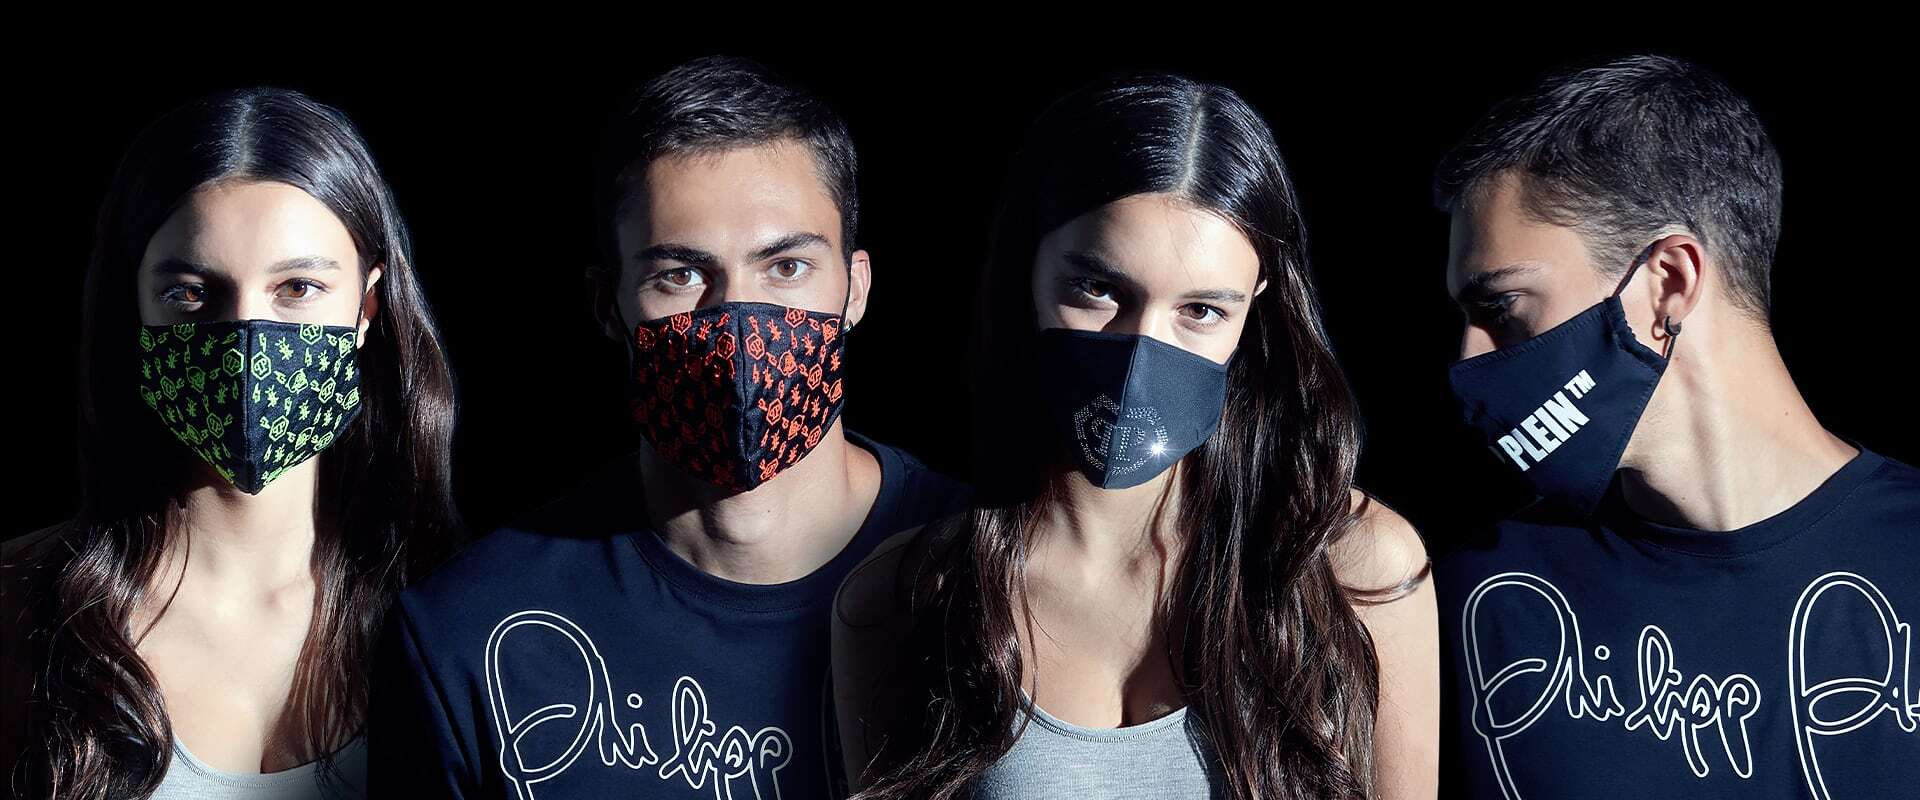 Philipp Plein Mask Image